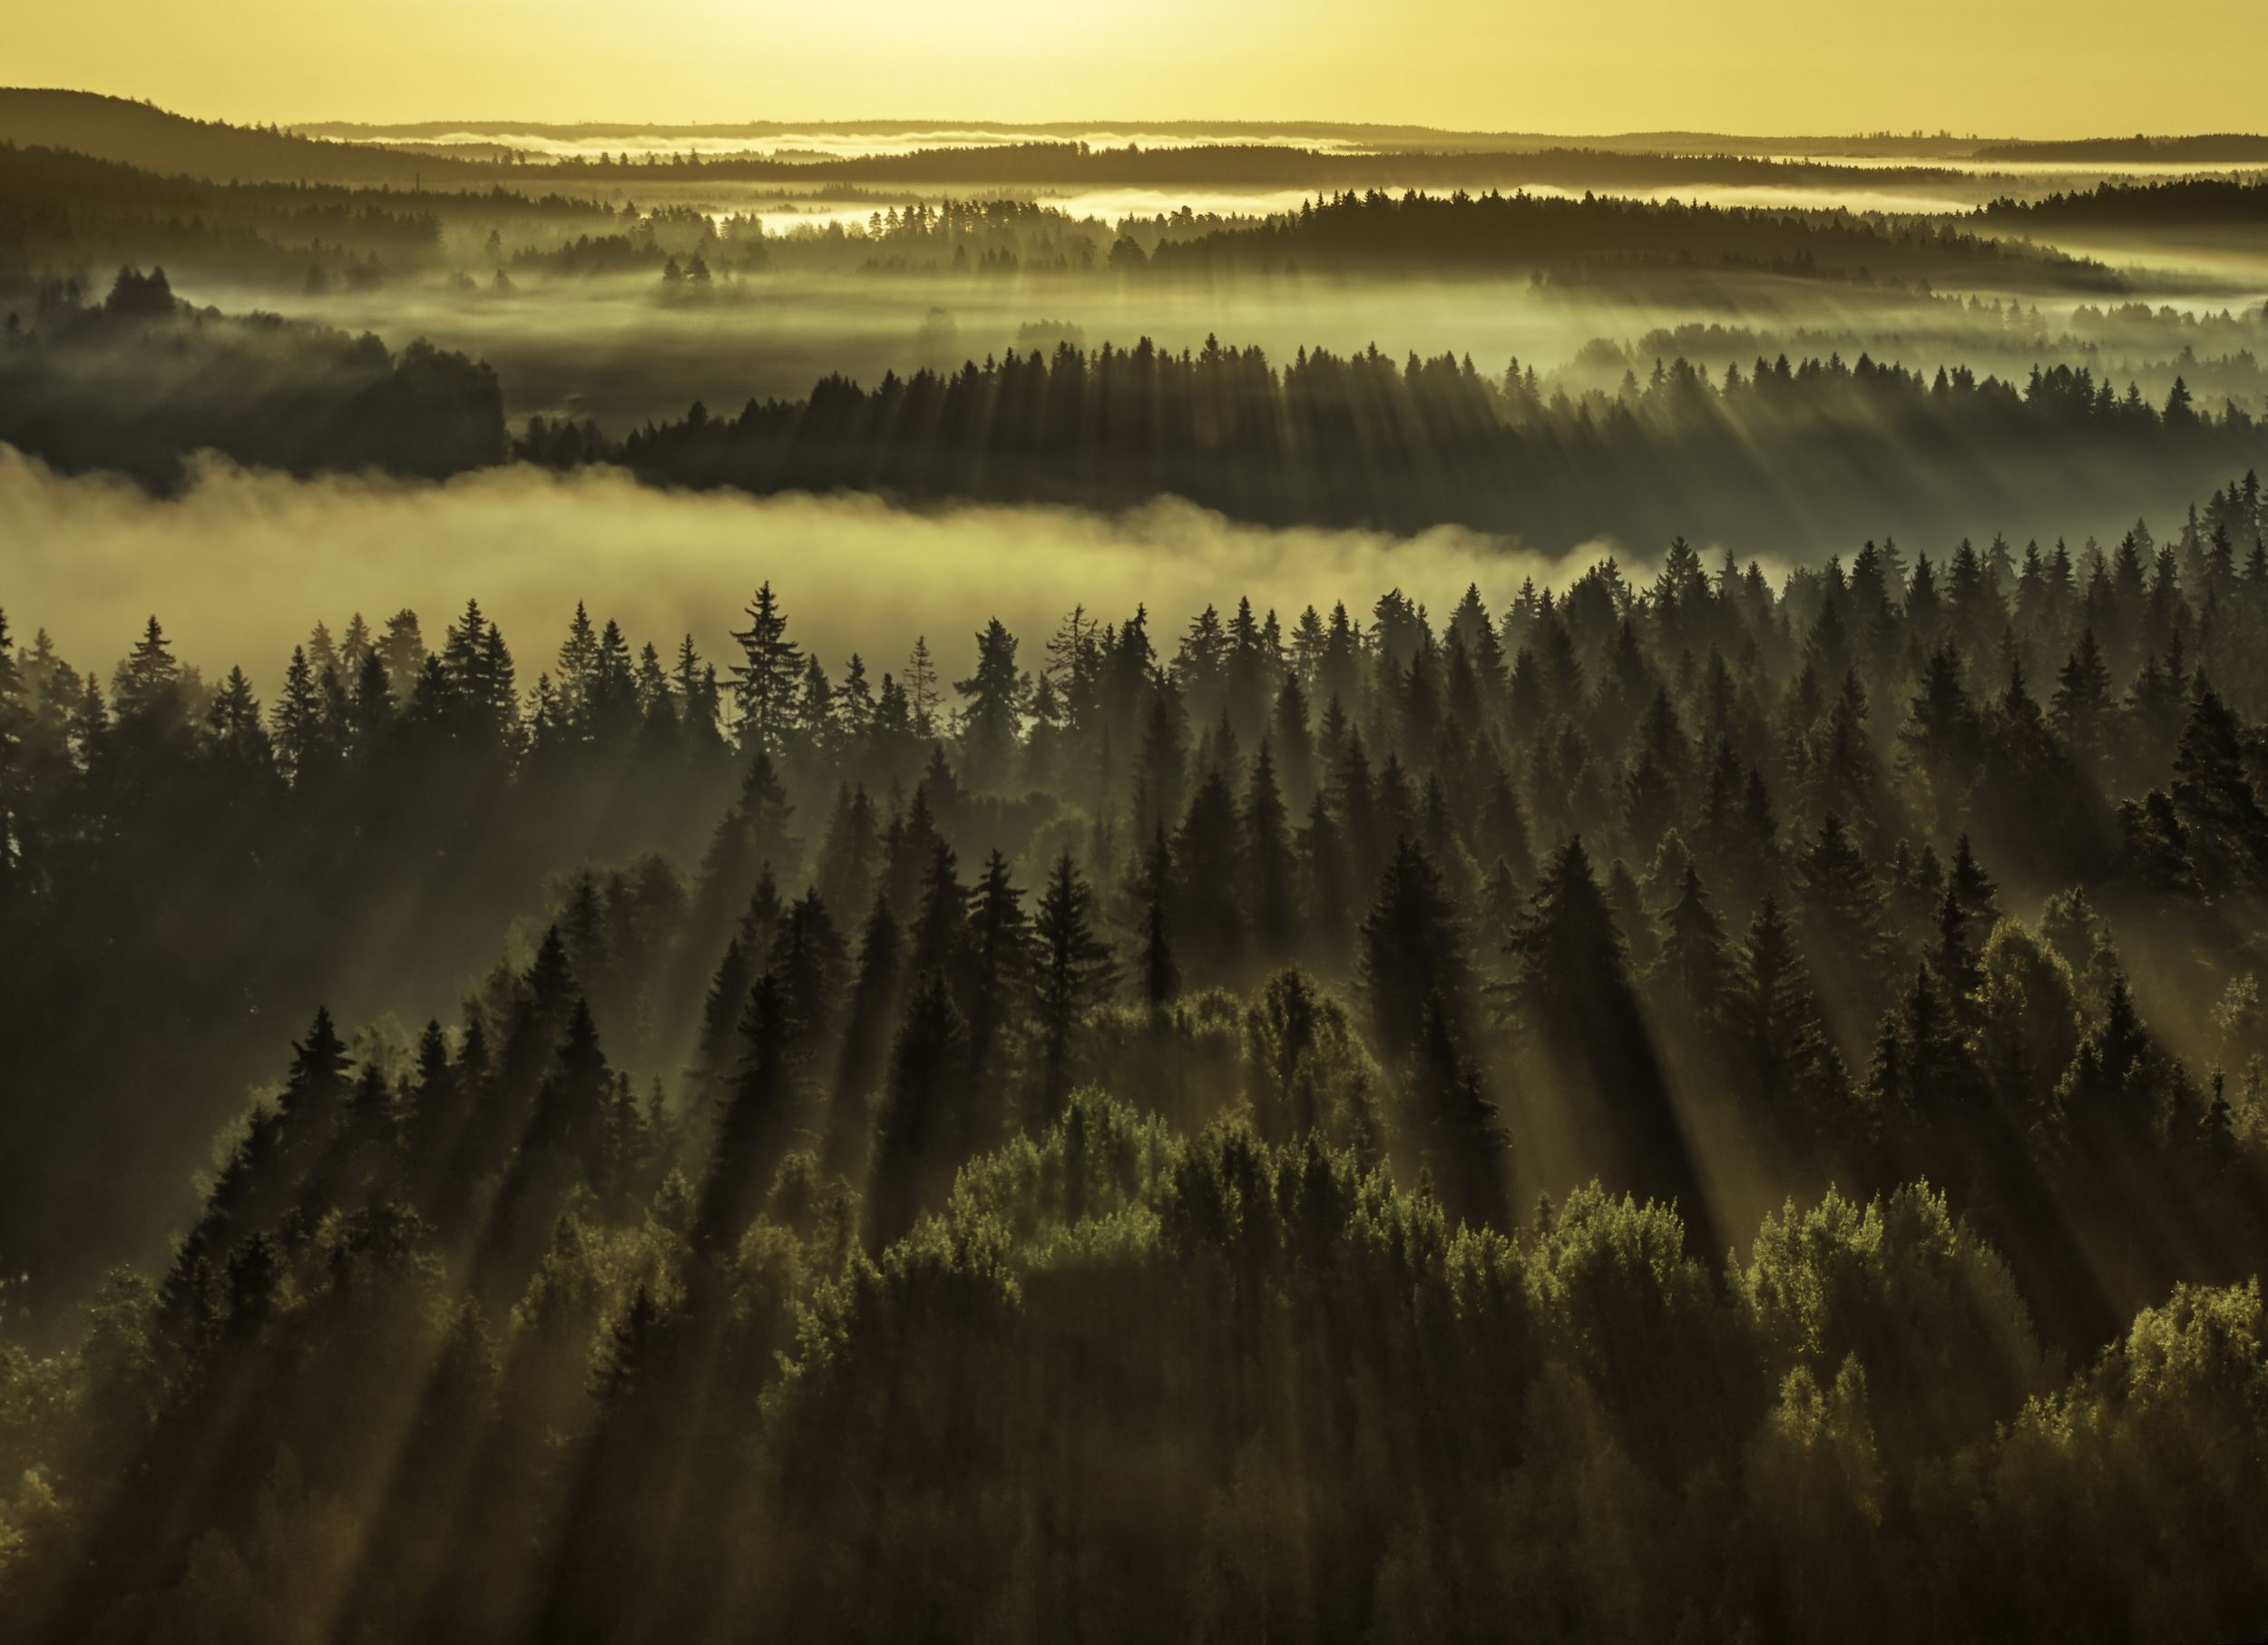 Stunning sun rays shining through trees in a foggy forest. Vanajaveden laakso. Aulanko, H?meenlinna, Finland.